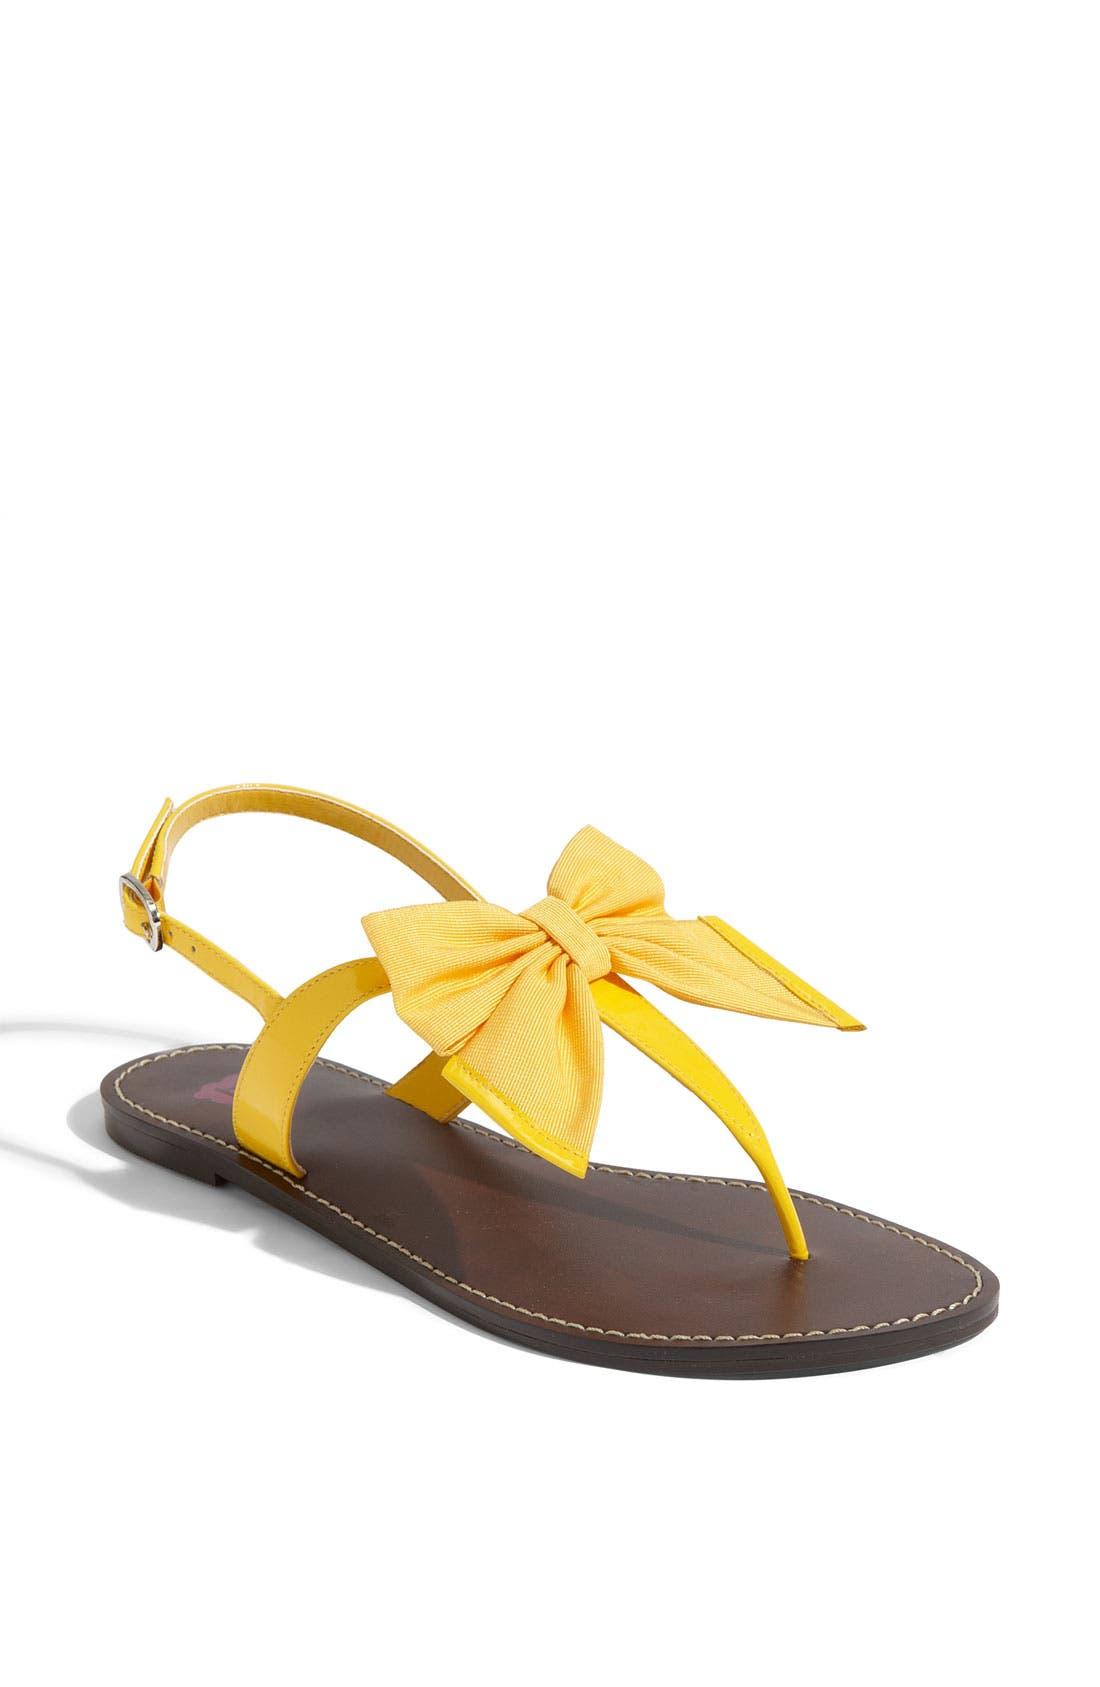 Alternate Image 1 Selected - BP. 'Valentine' Sandal